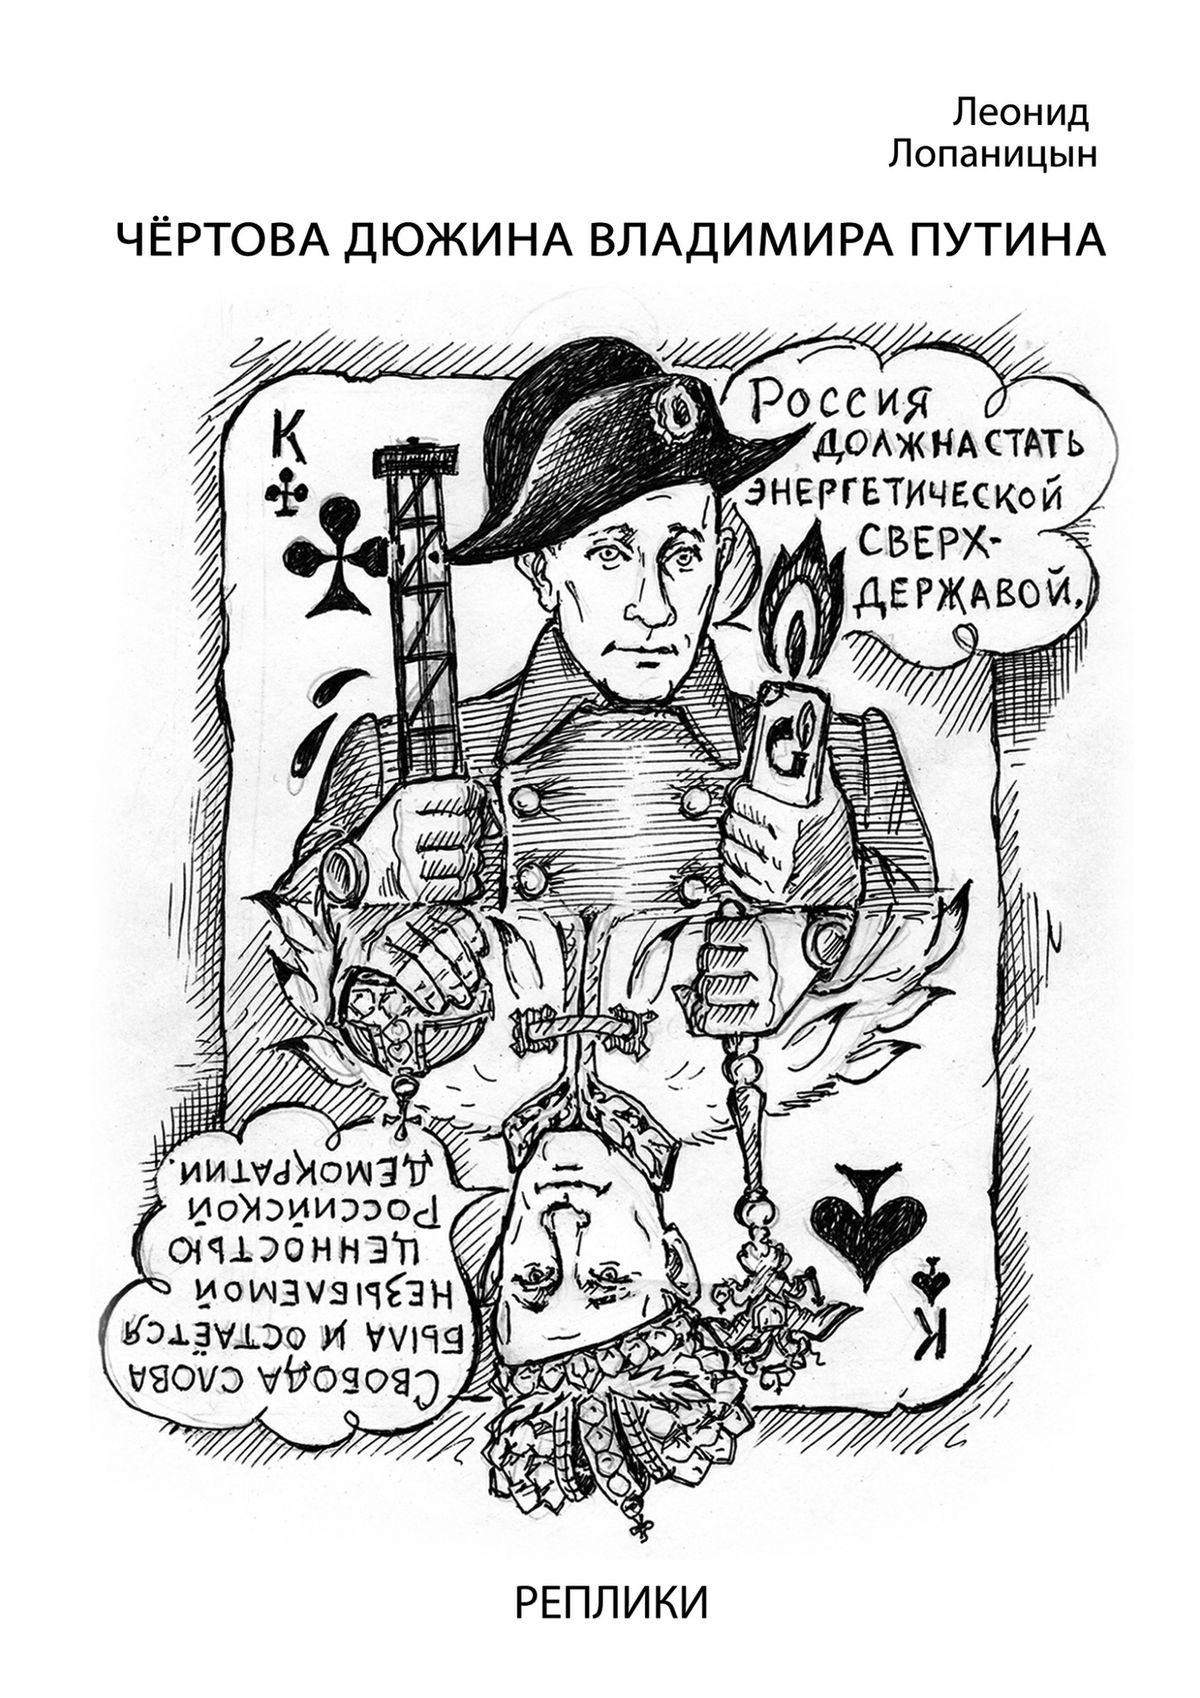 Леонид Лопаницын Чёртова дюжина Владимира Путина. Реплики реплики булгари